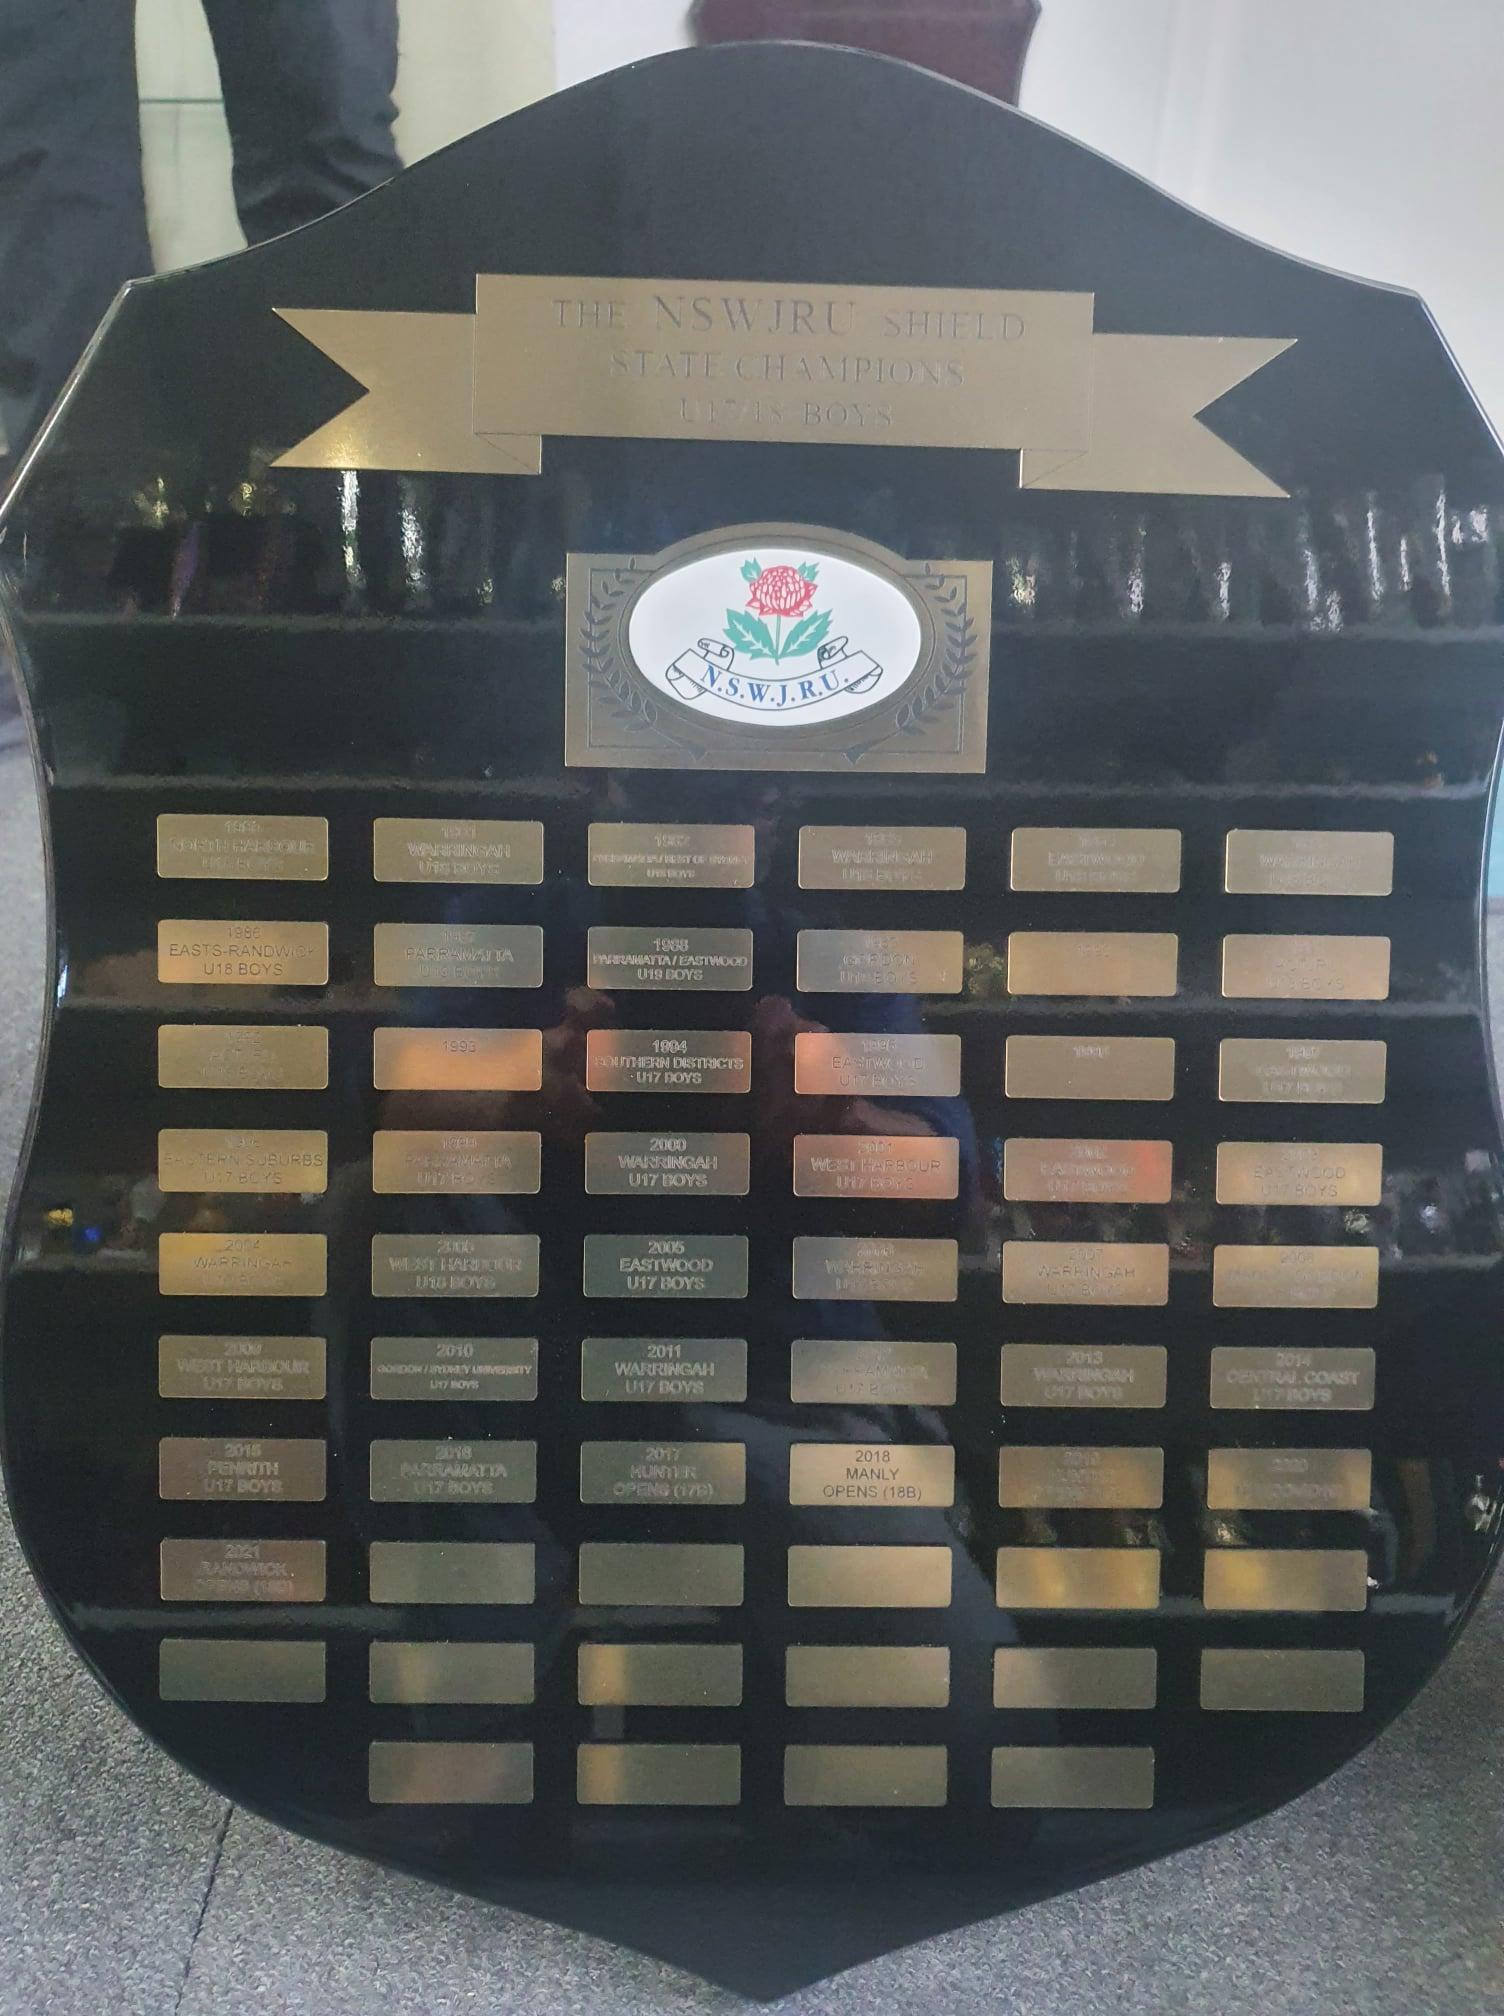 NSWJRU State Championship Trophies (Arch